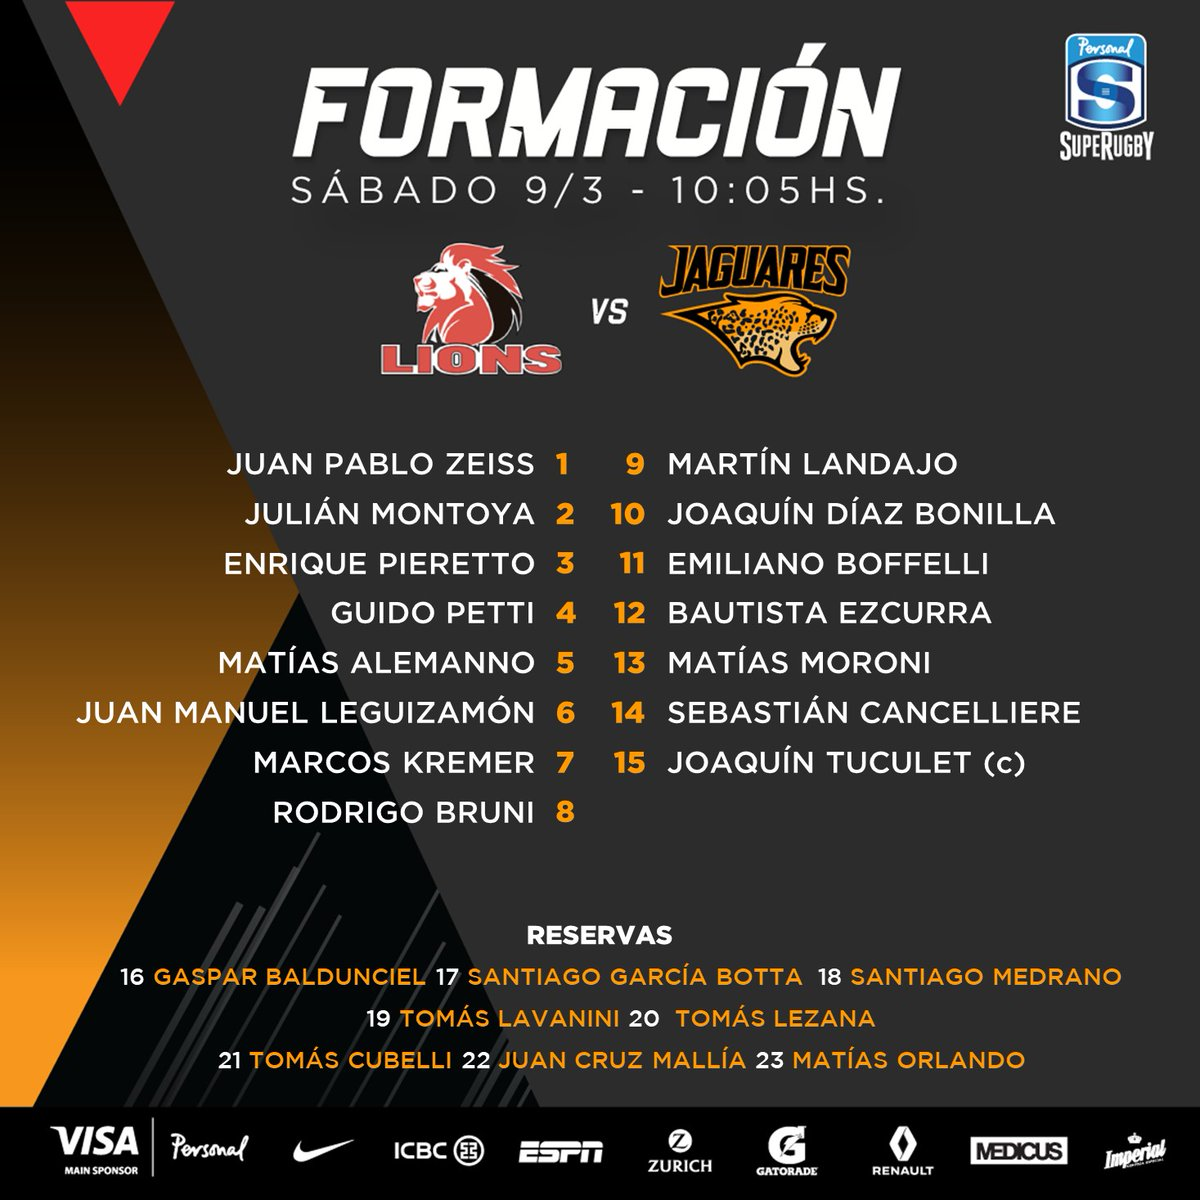 Formación de Jaguares ante Lions #LIOvJAG #ViviJaguares #PersonalSuperRugby